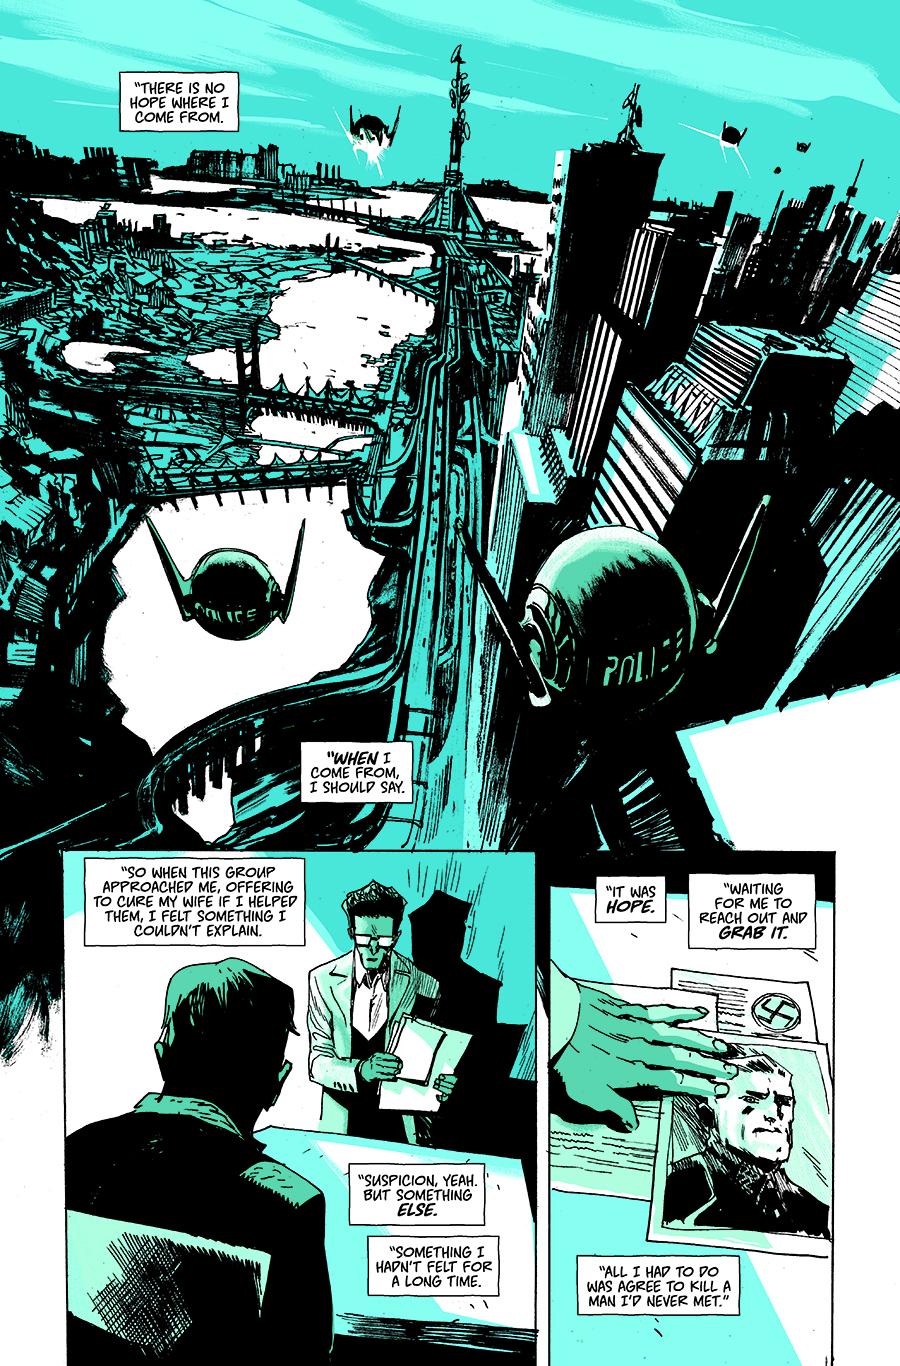 EI8HT dark horse comic issue #4